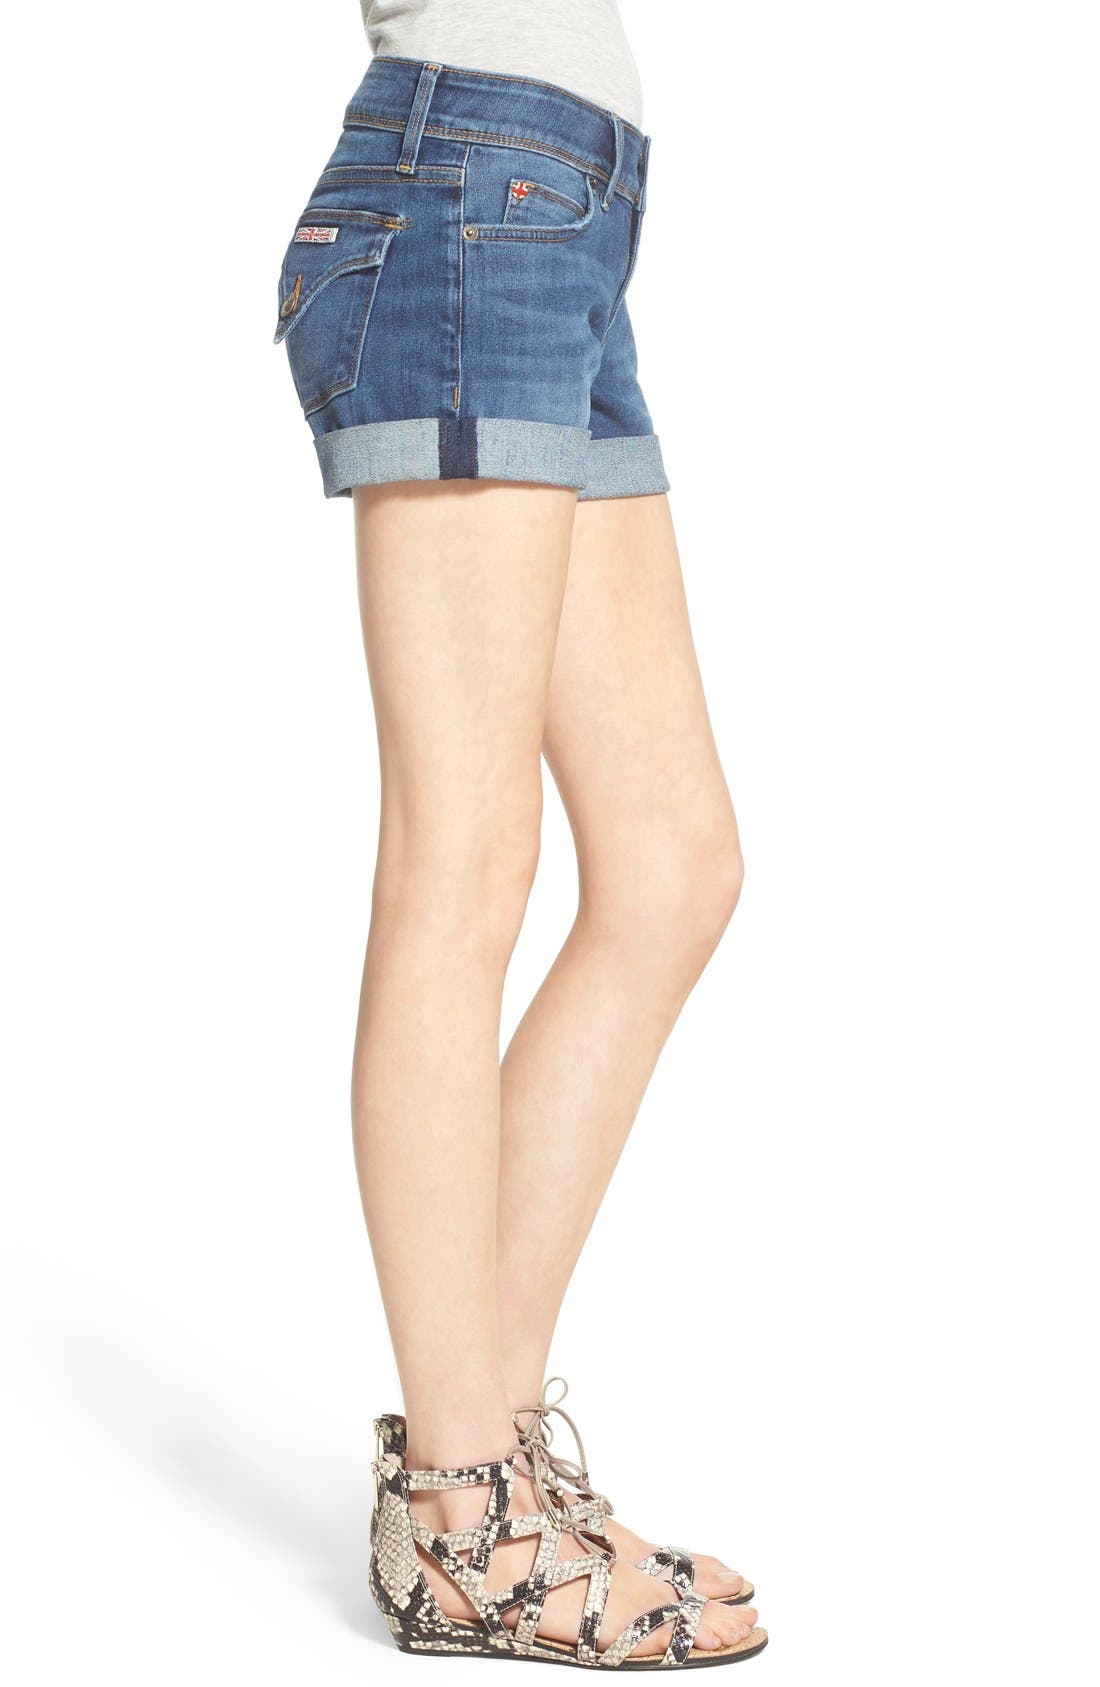 Alternate Image 3  - Hudson Jeans 'Croxley' Cuffed Denim Shorts (Advantageous)